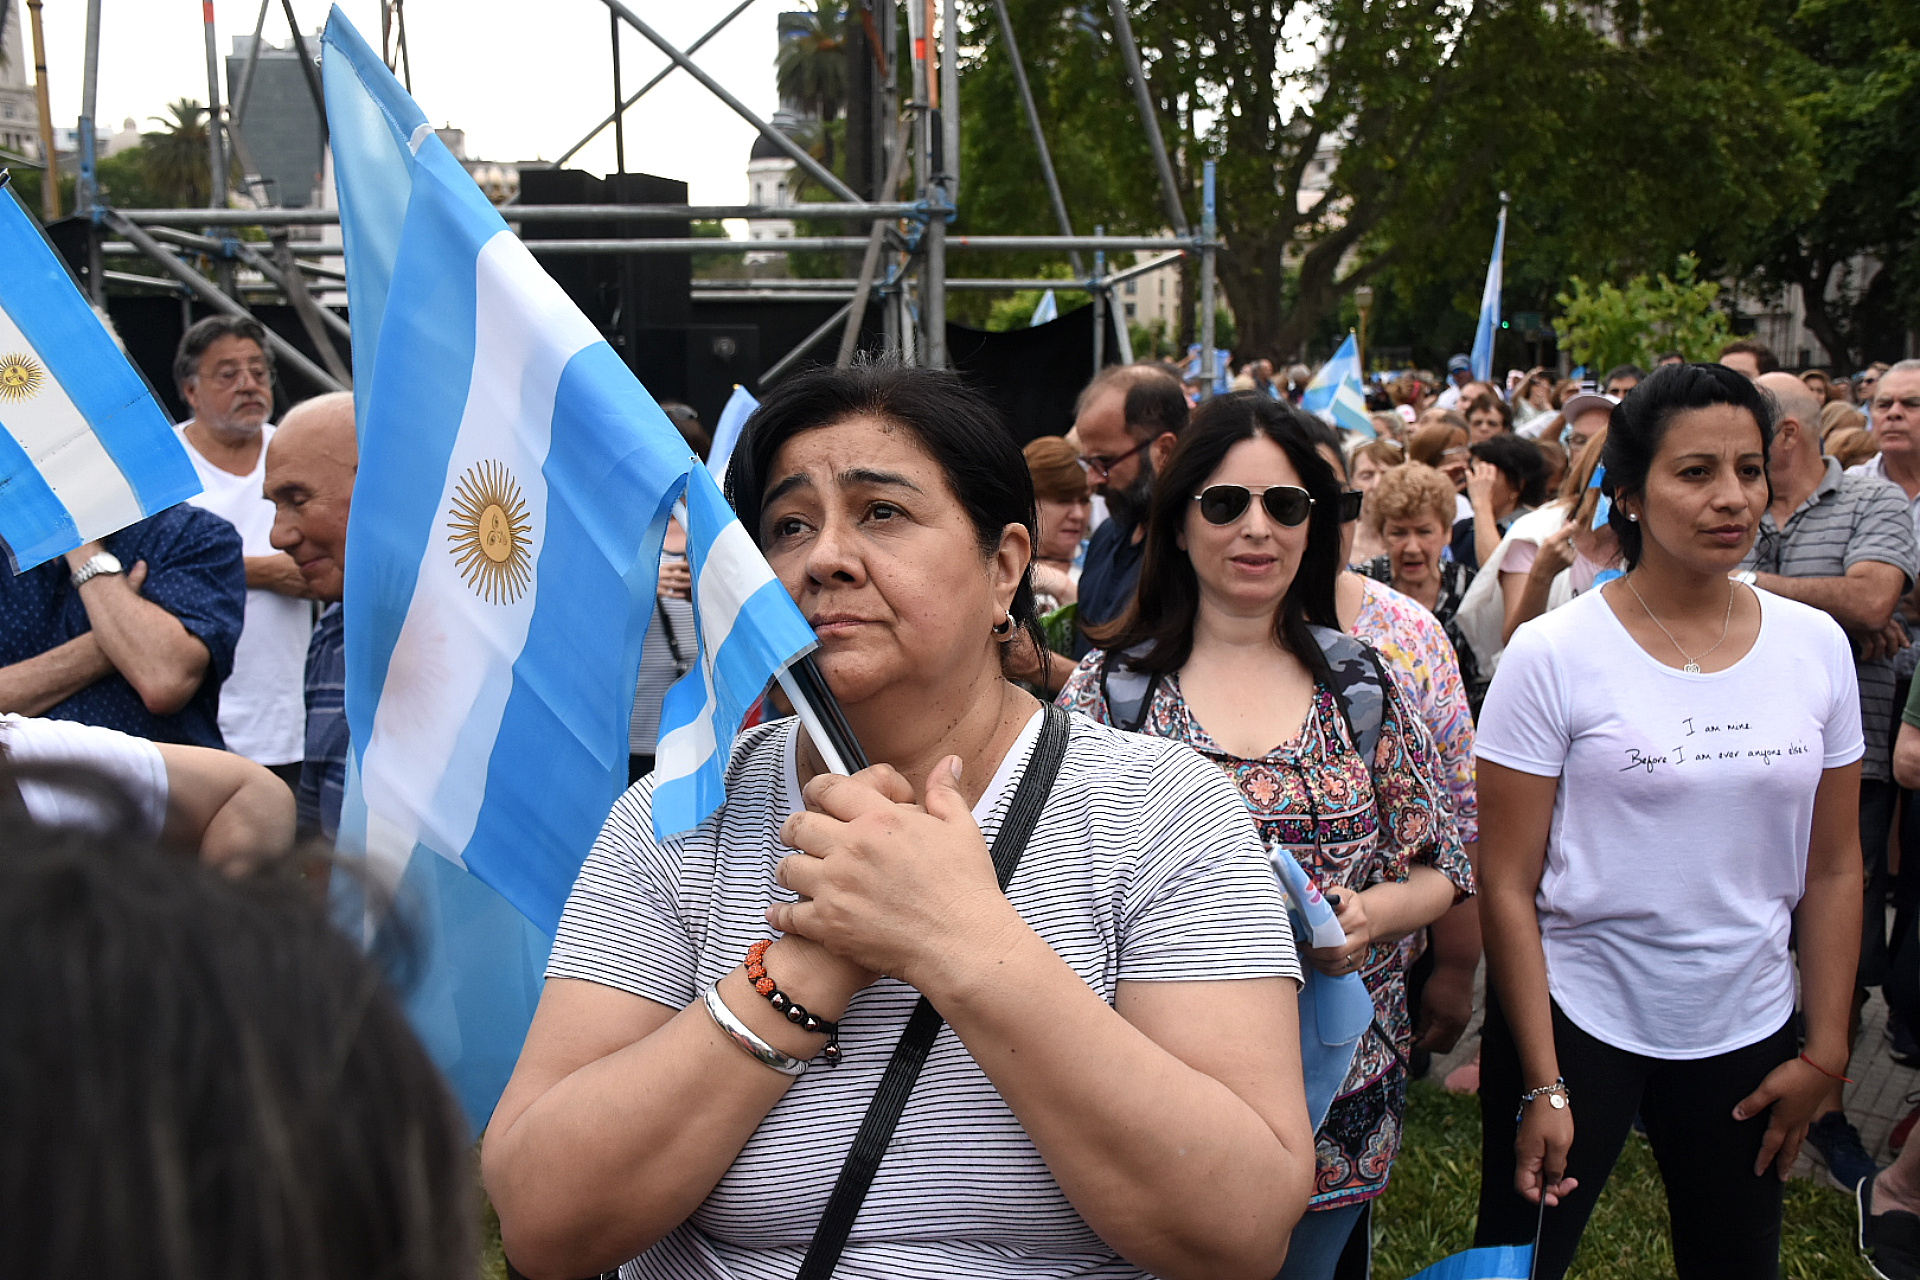 (Fotos: Nicolás Stulberg, Gustavo Gavotti, Thomas Khazki, Reuters)